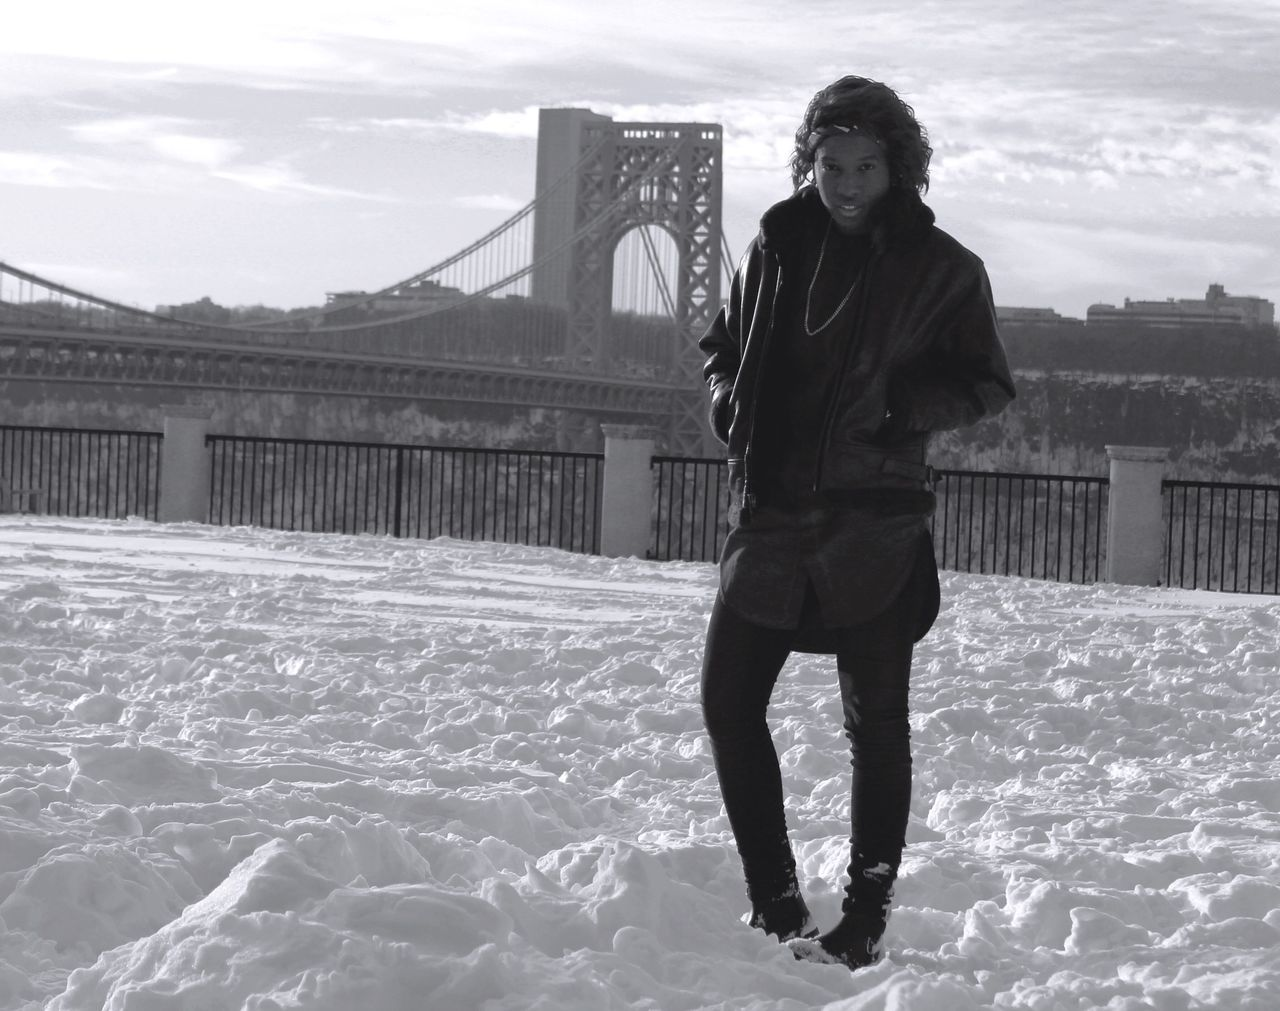 Portrait Of A Woman George Washington Bridge New York City Snow Confident  Sunny Day Modeling Photo View From Across The Bridge (NY)